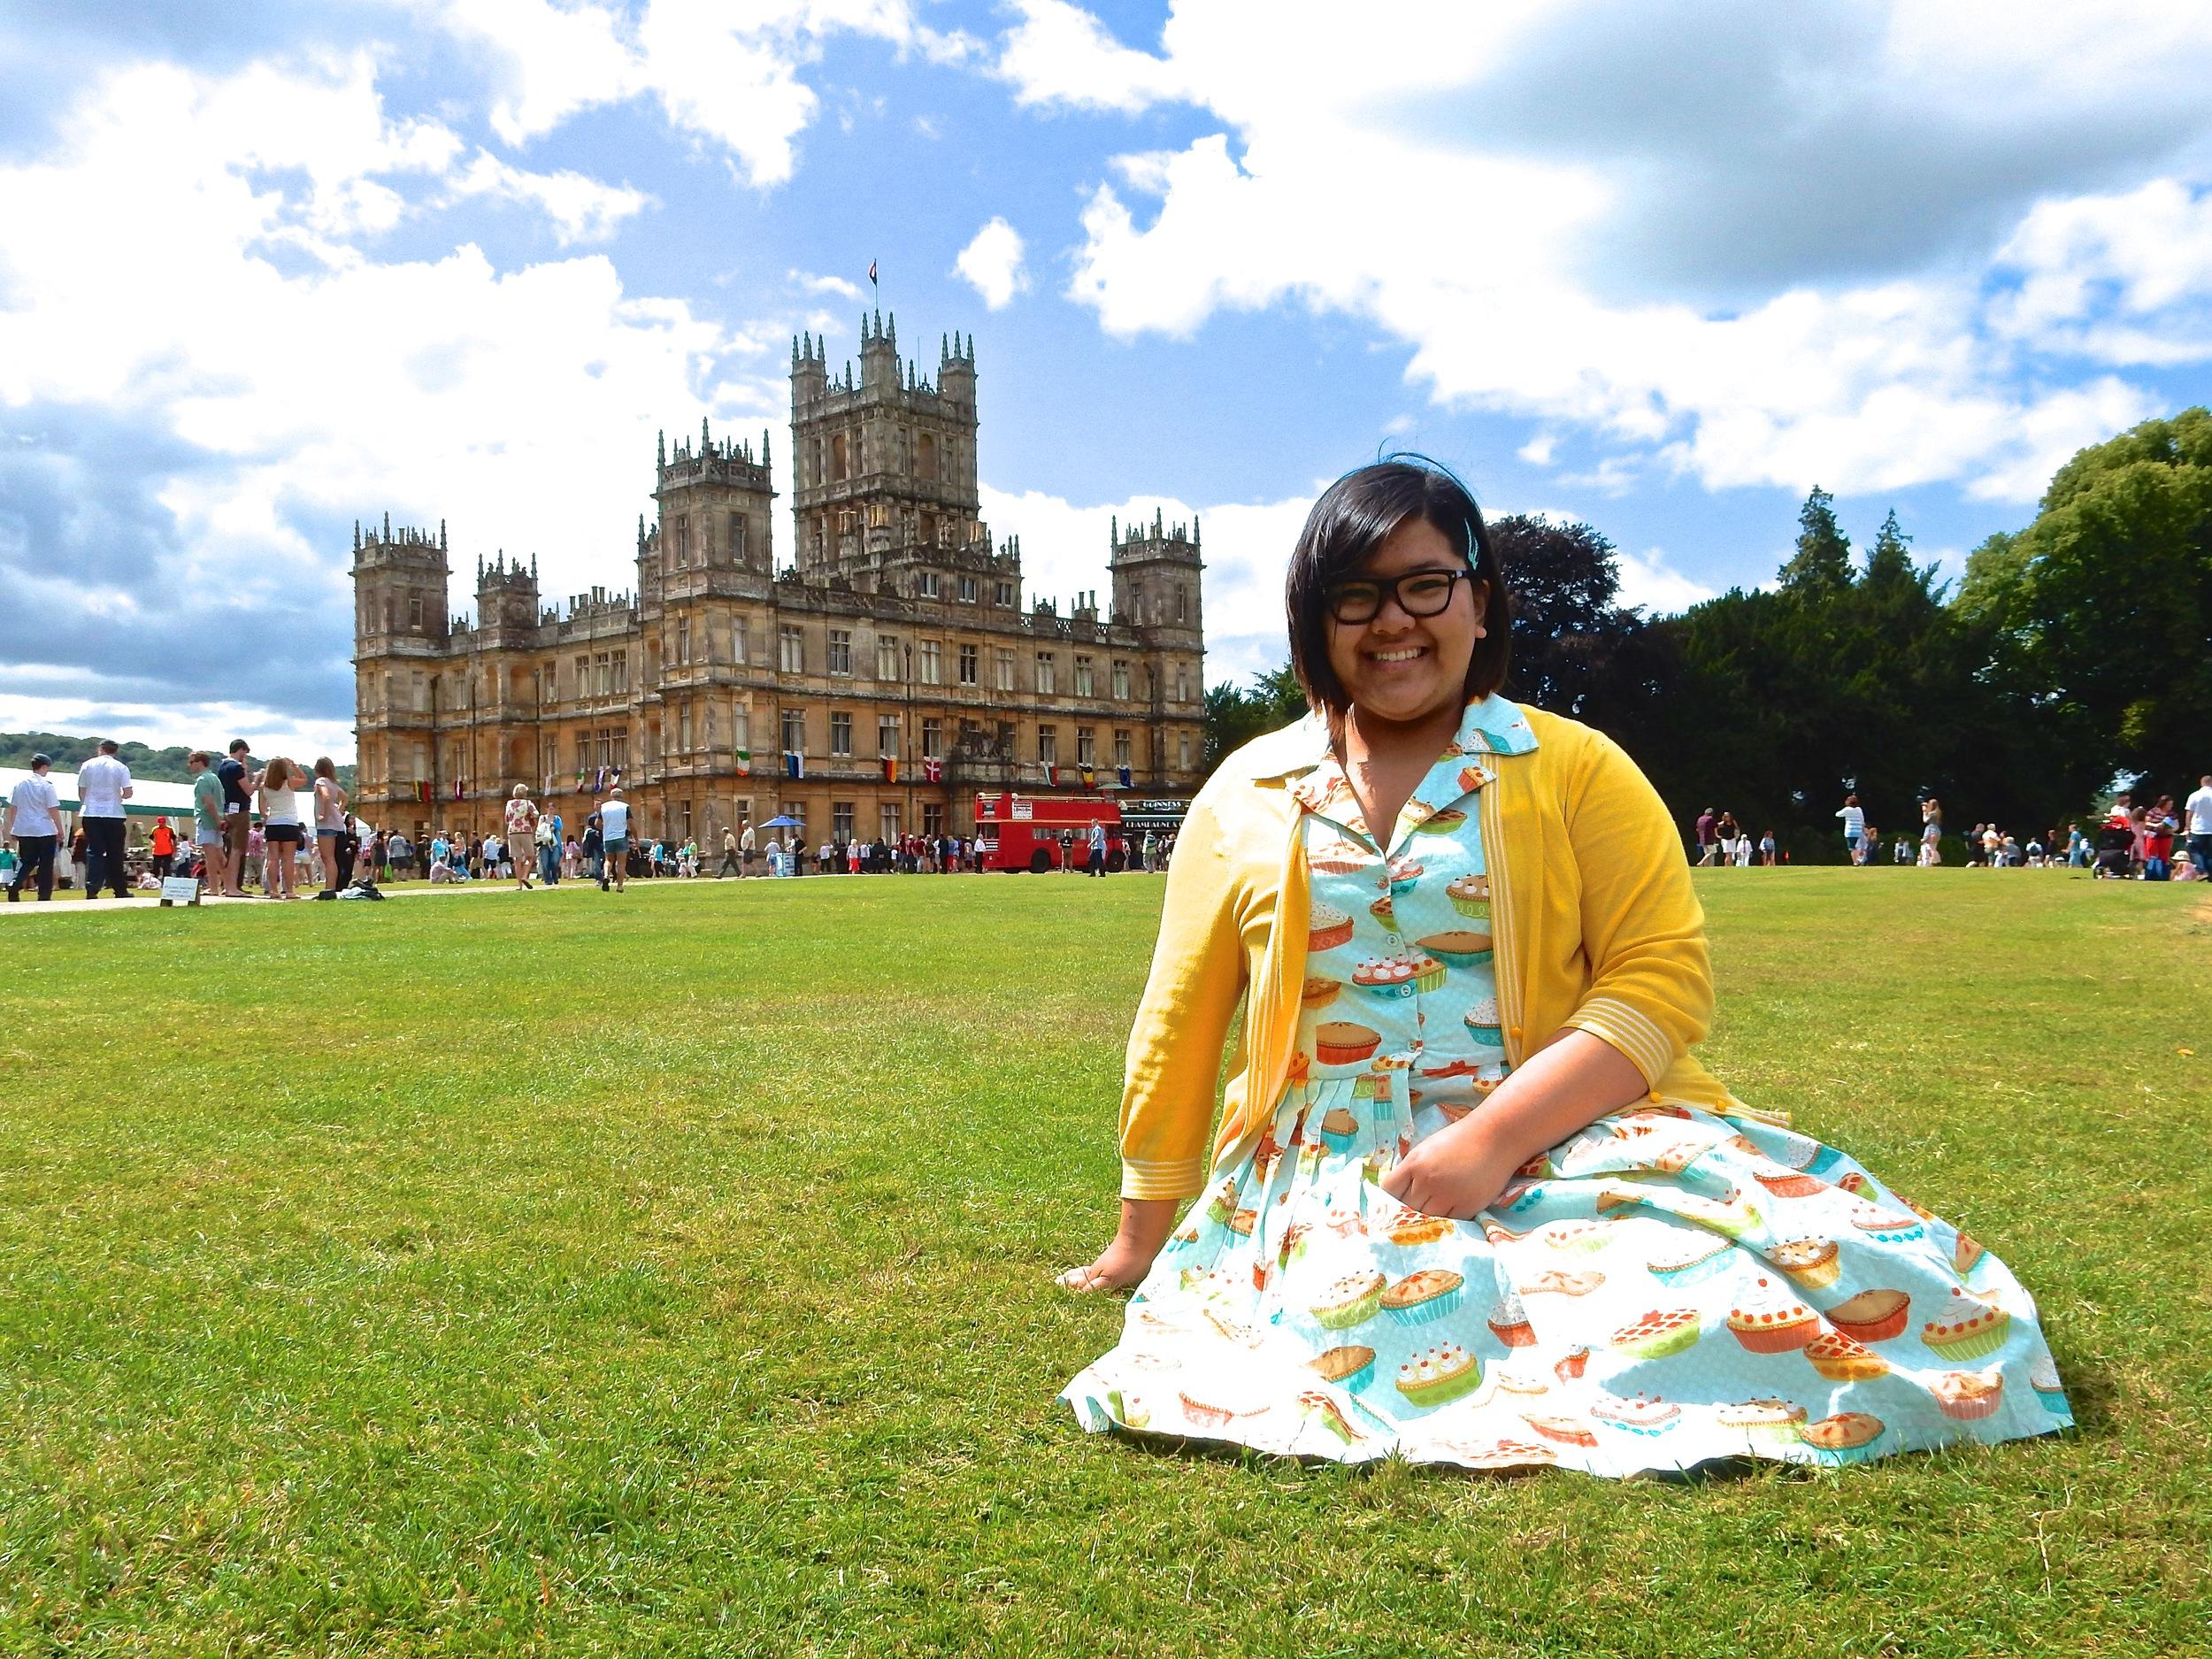 Jenenjoying ASummer Day at Downton Abbey. Taken at Highclere Castle, Newbury, England, August 2014.